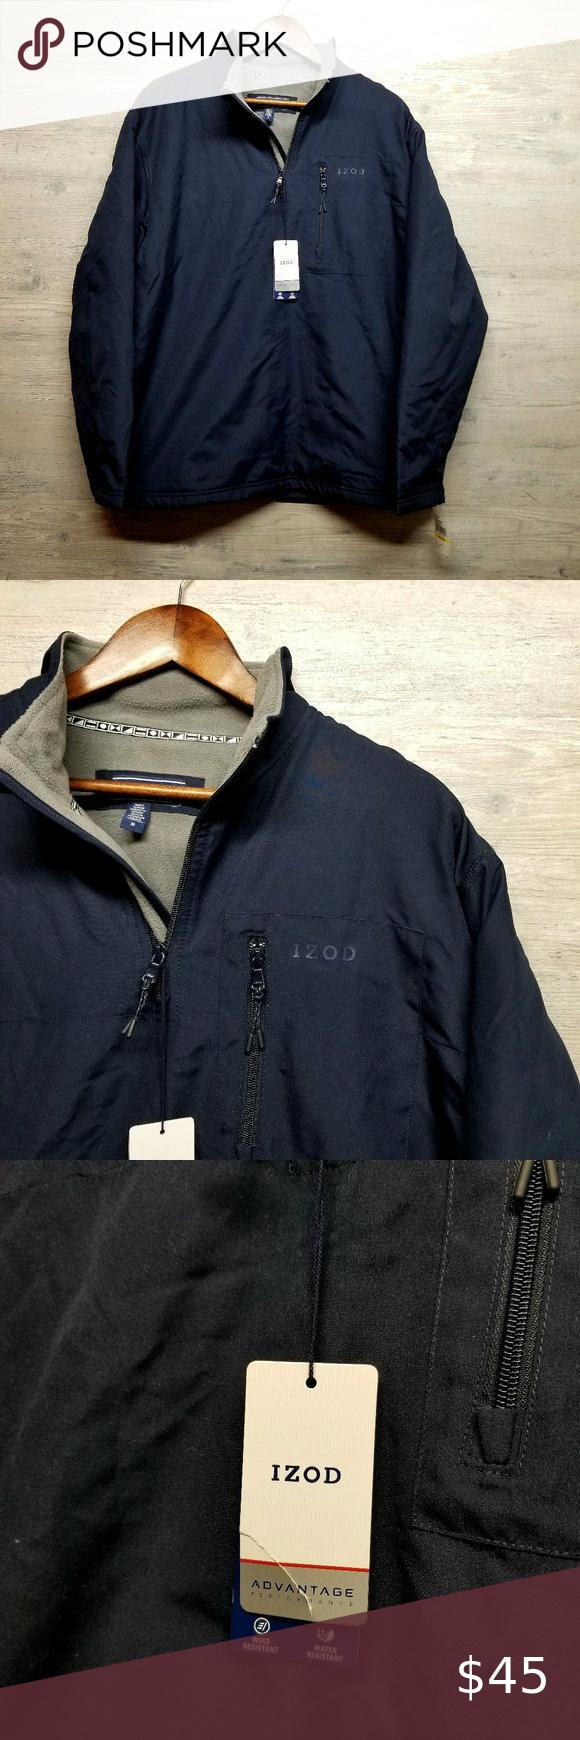 Nwt Izod Advantage Fleece Lined Jacket 125 Msrp Line Jackets Jackets Izod [ 1740 x 580 Pixel ]